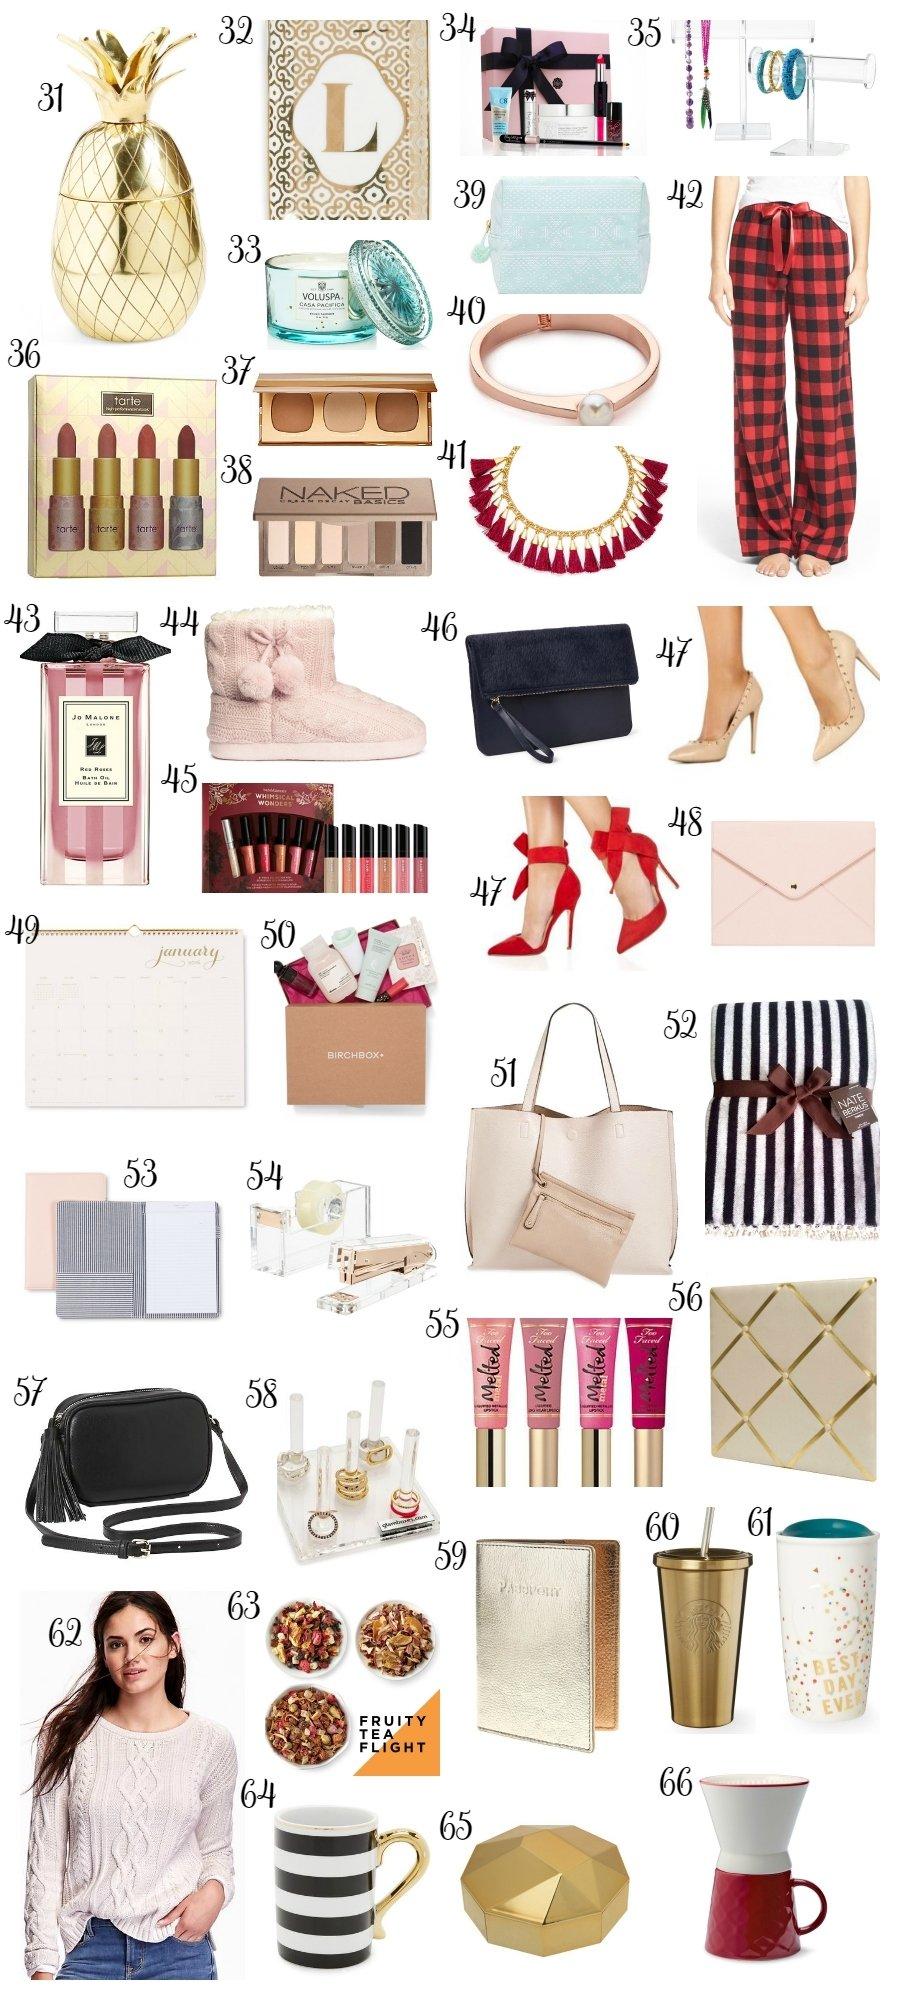 10 Beautiful Gift Ideas For Women 30 christmas gift ideas under 30 ashley brooke nicholas 3